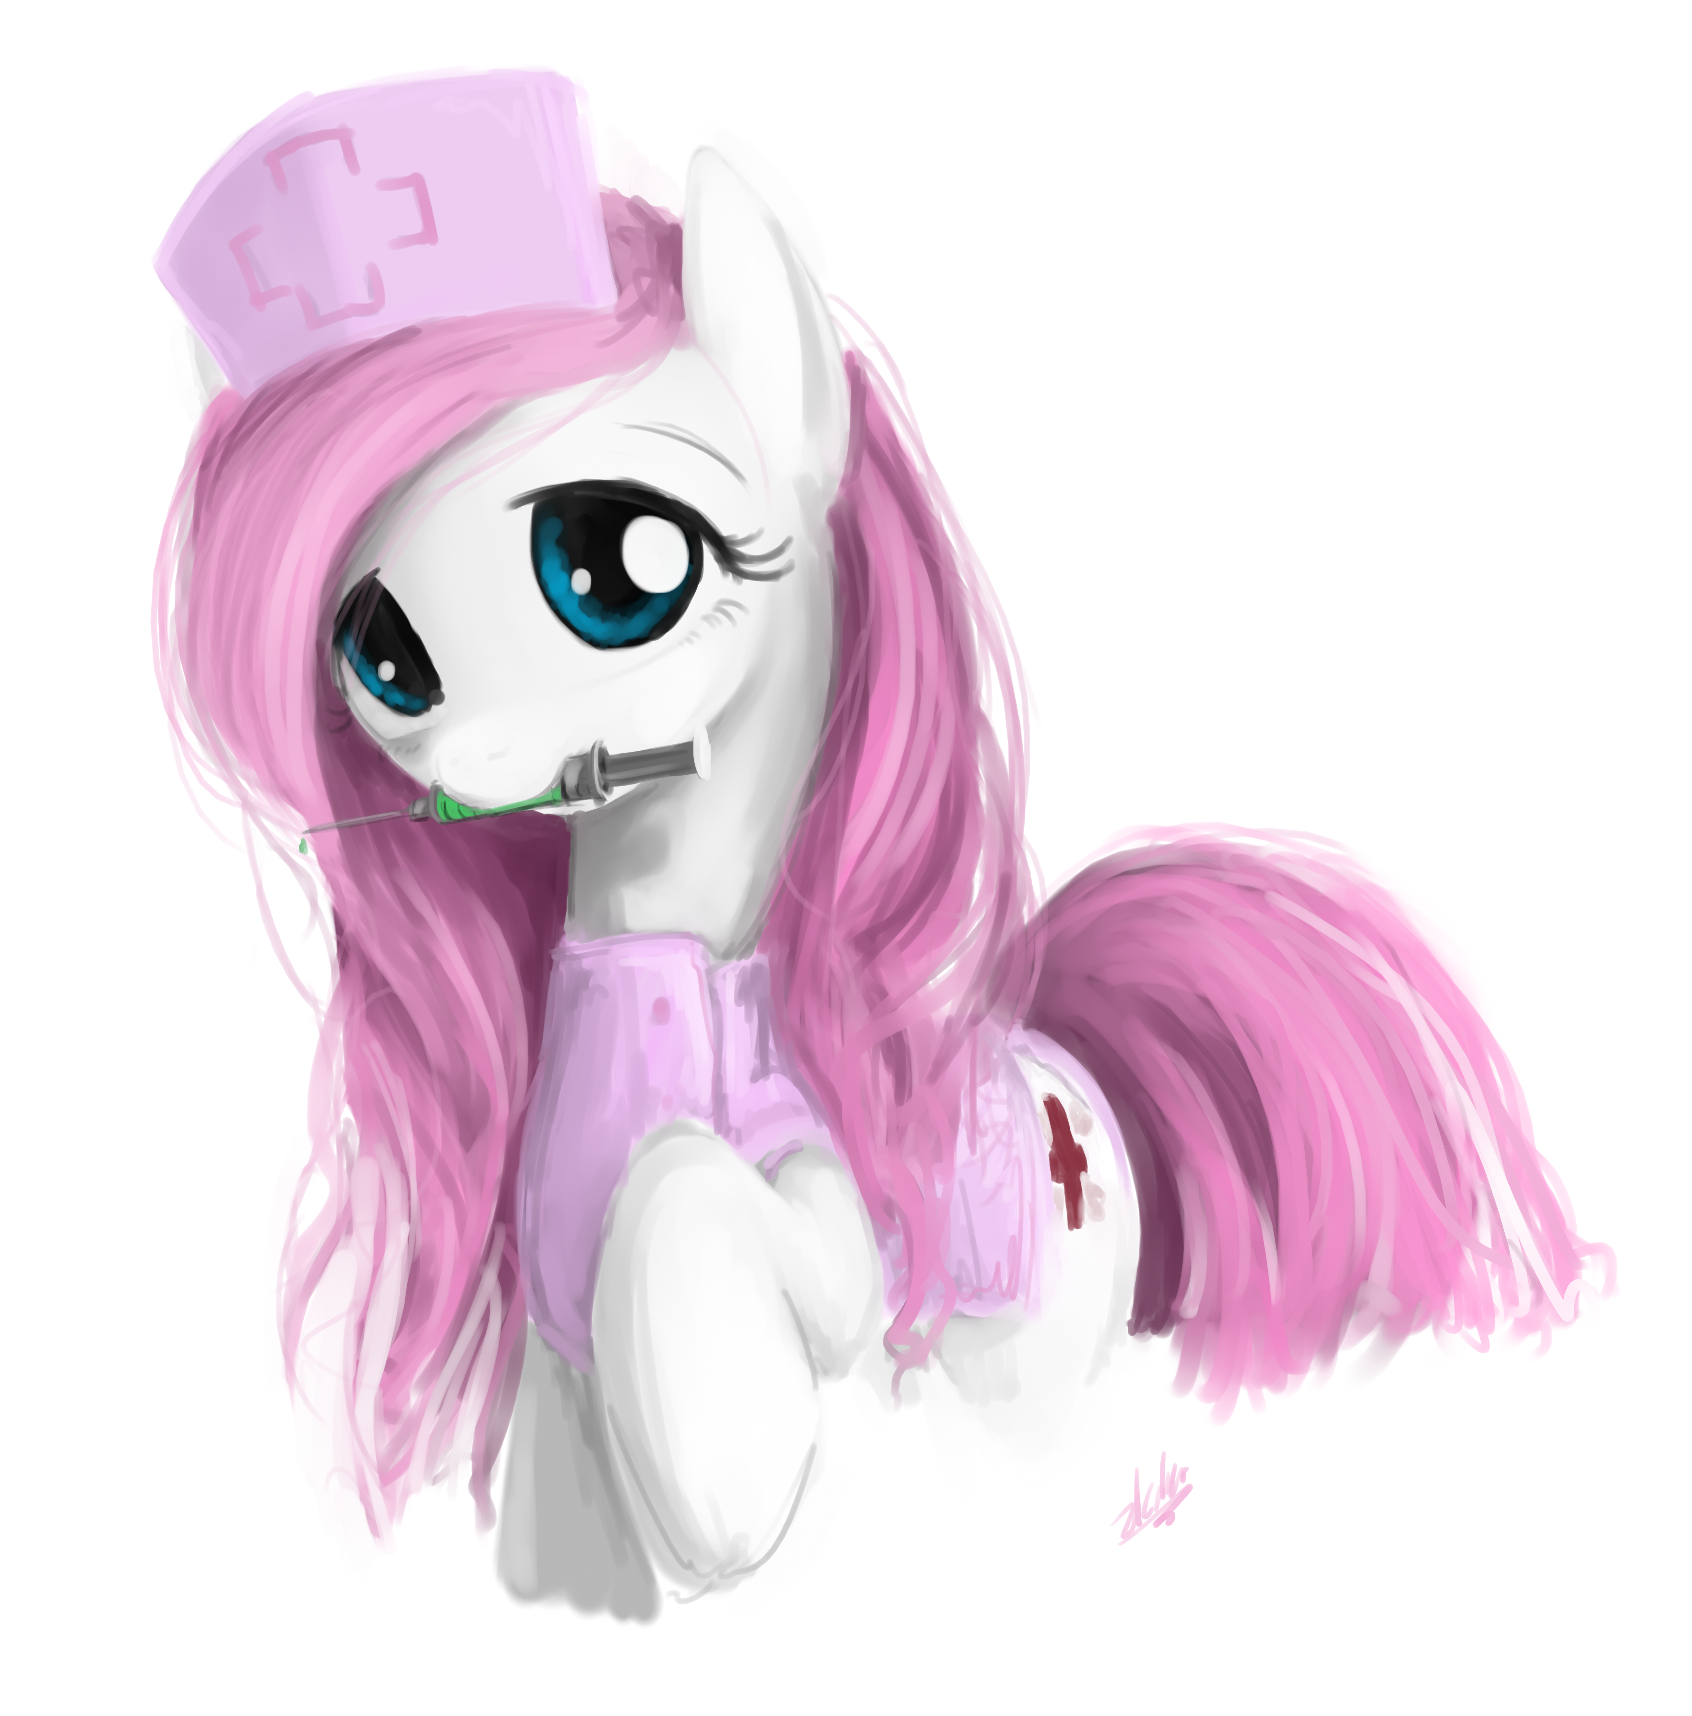 Nurse Redheart by zlack3r